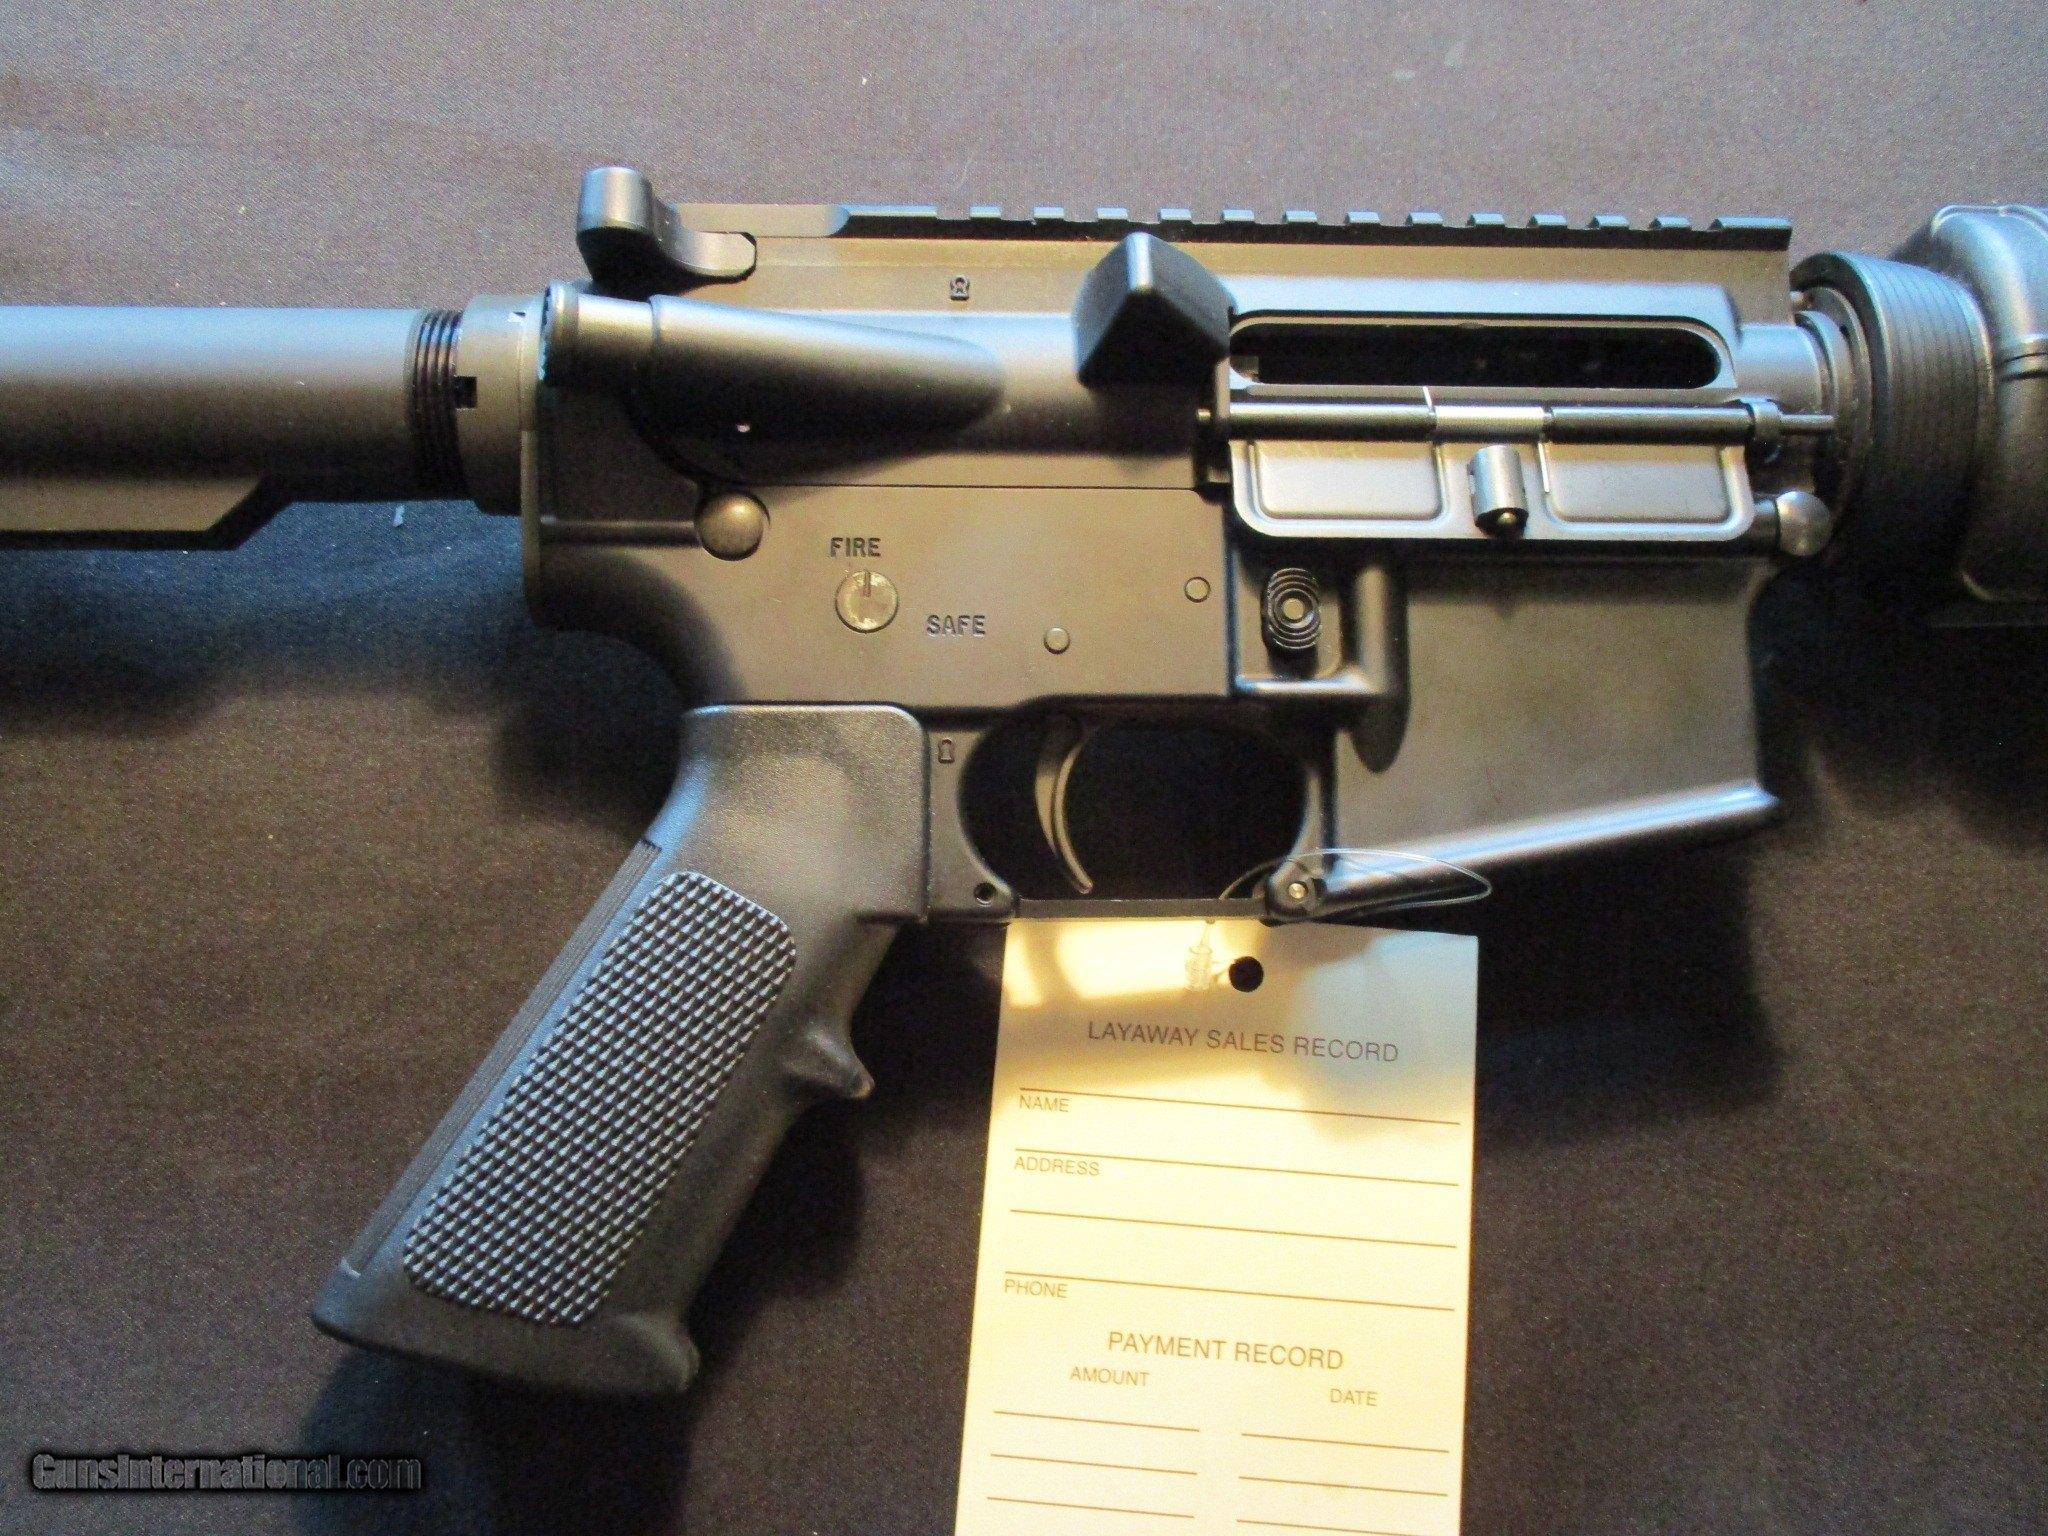 Bushmaster XM-15 E2S AR 15 Optics Ready Flat Top, Collapsible stock